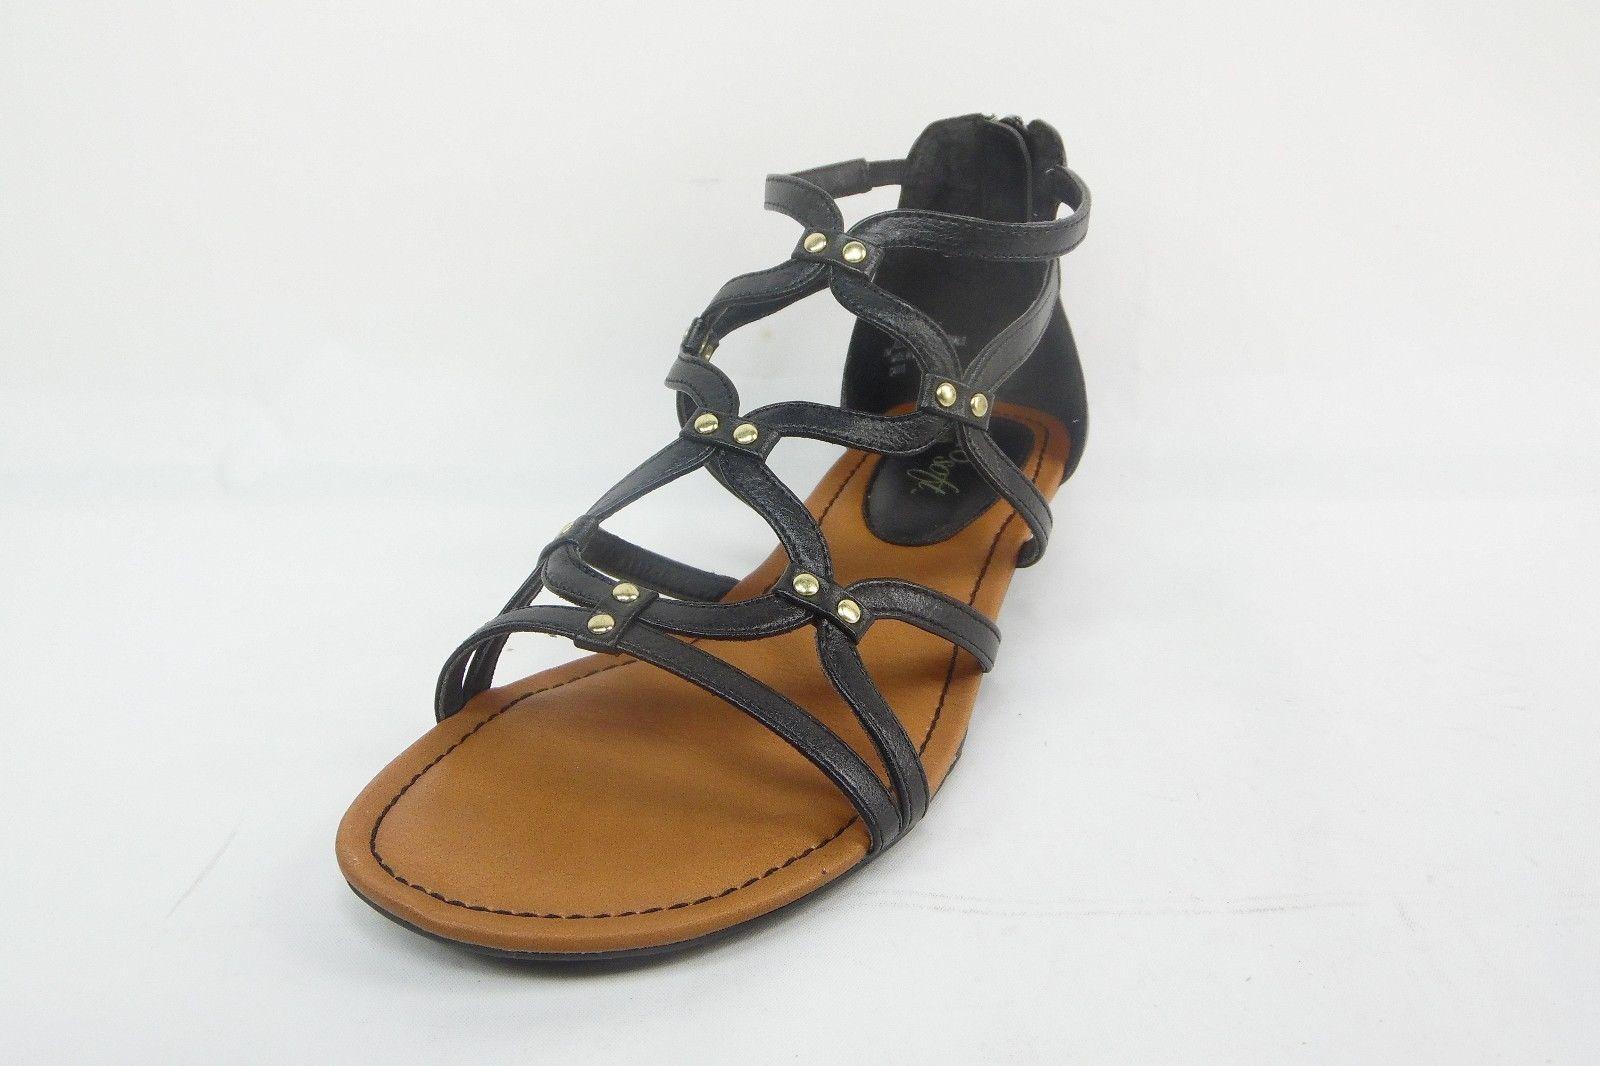 847088d5346b Eurosoft by Sofft Mekelle Women Black and 50 similar items. 57